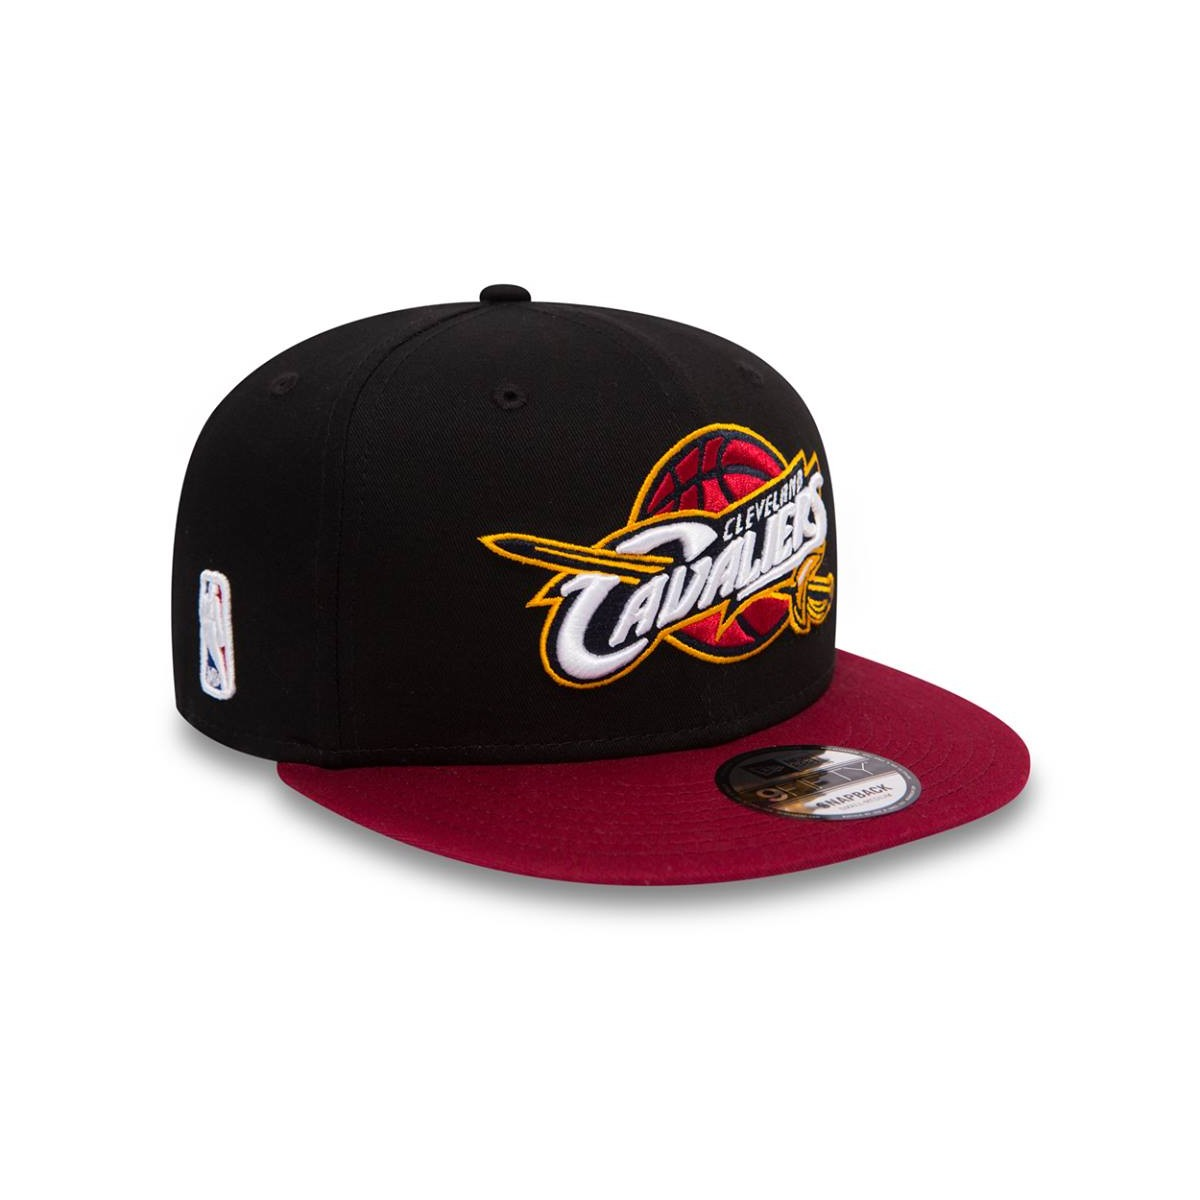 CAPPELLO NEW ERA 9FIFTY BLACK BASE CLEVELAND CAVALIERS BASKET NBA ... a4d600c9b54d